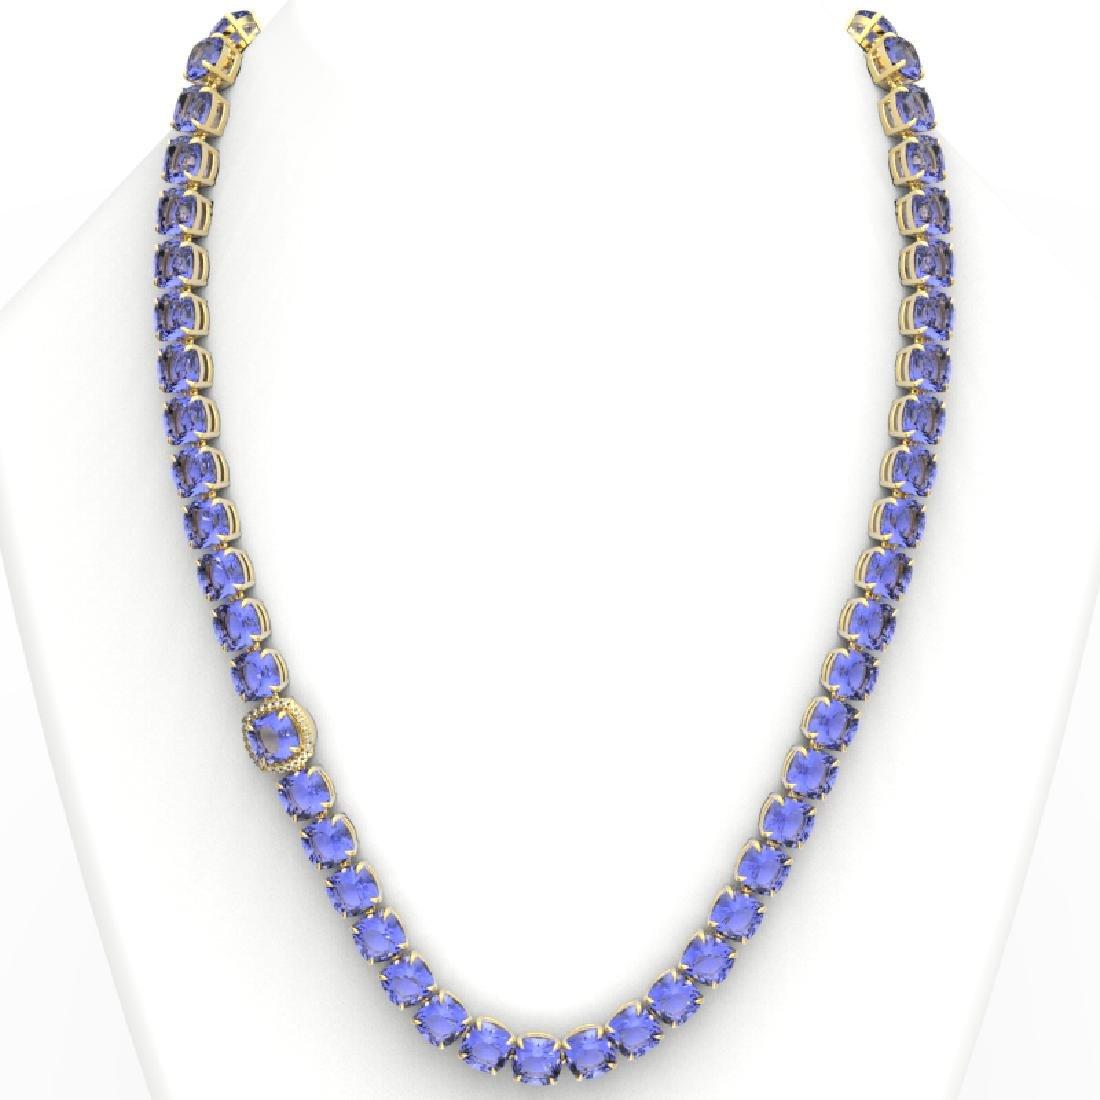 100 CTW Tanzanite & VS/SI Diamond Necklace 14K Yellow - 3